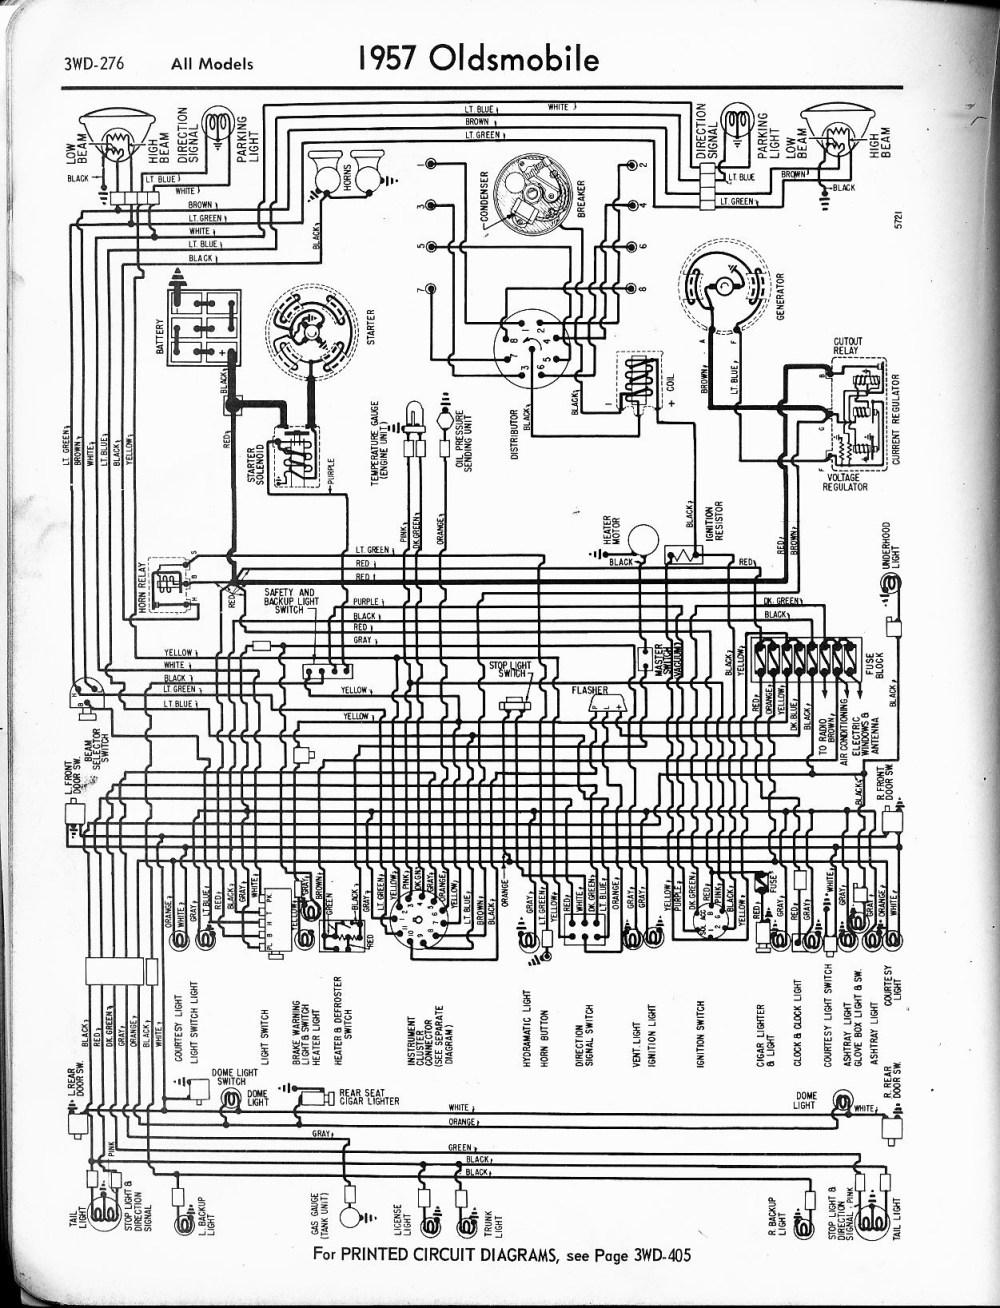 medium resolution of 1998 honda accord engine diagram oldsmobile wiring diagrams the old car manual project of 1998 honda 1998 honda accord engine diagram honda cr v radio